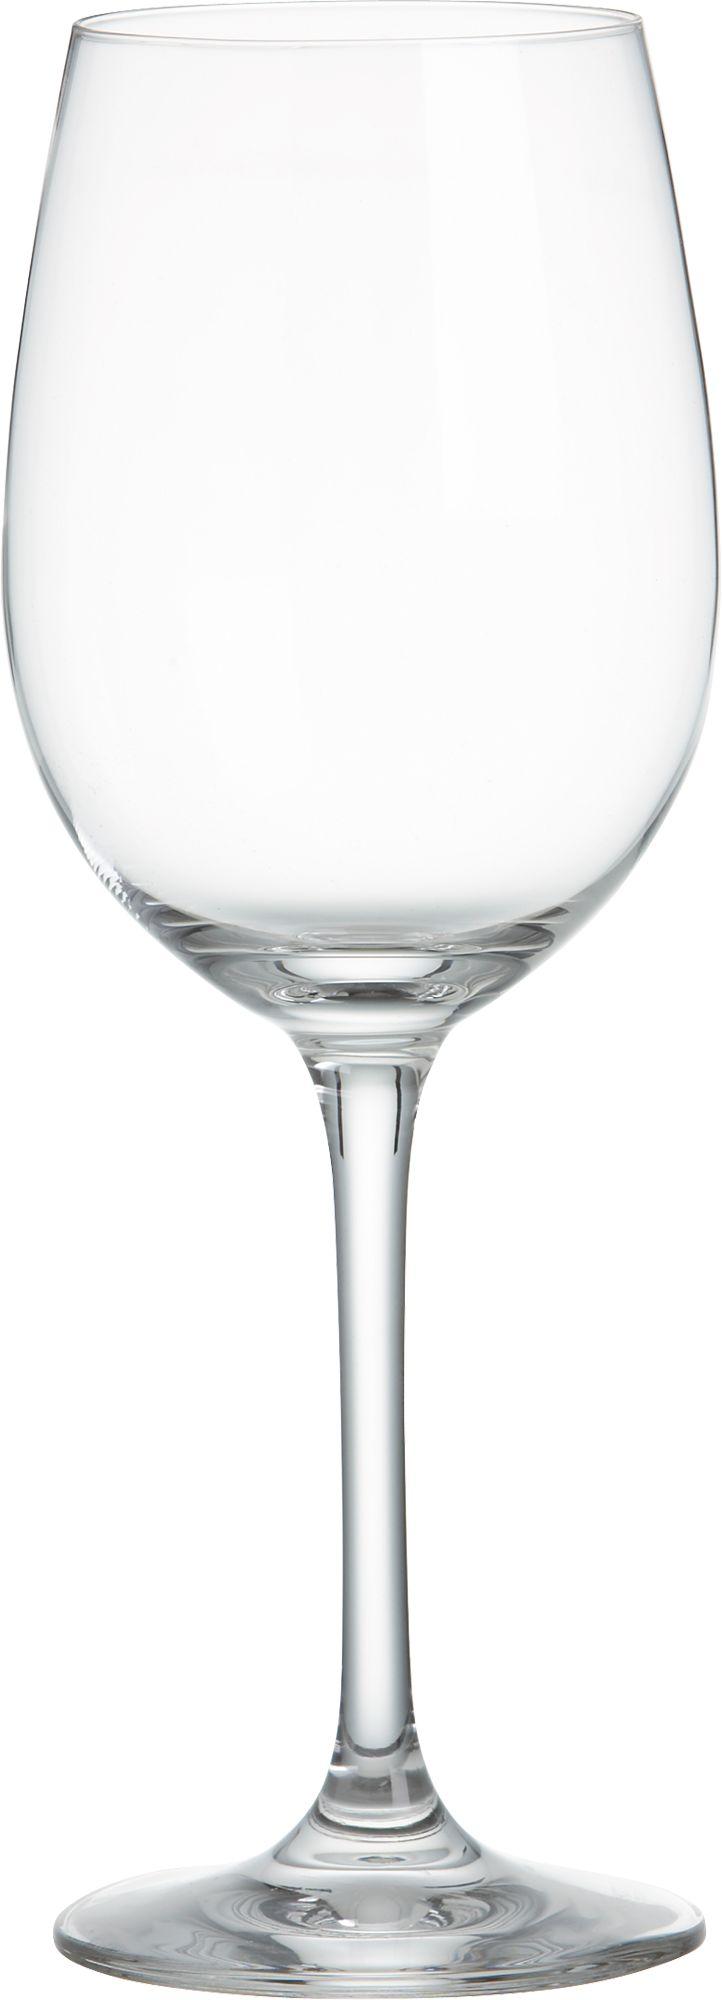 Oversized, all-purpose wine glass is crafted in Germany of lead-free Tritan® glass with the brilliance of crystal.<br /><br /><NEWTAG/><ul><li>Tritan® glass</li><li>Hand wash</li><li>Made in Germany</li></ul>